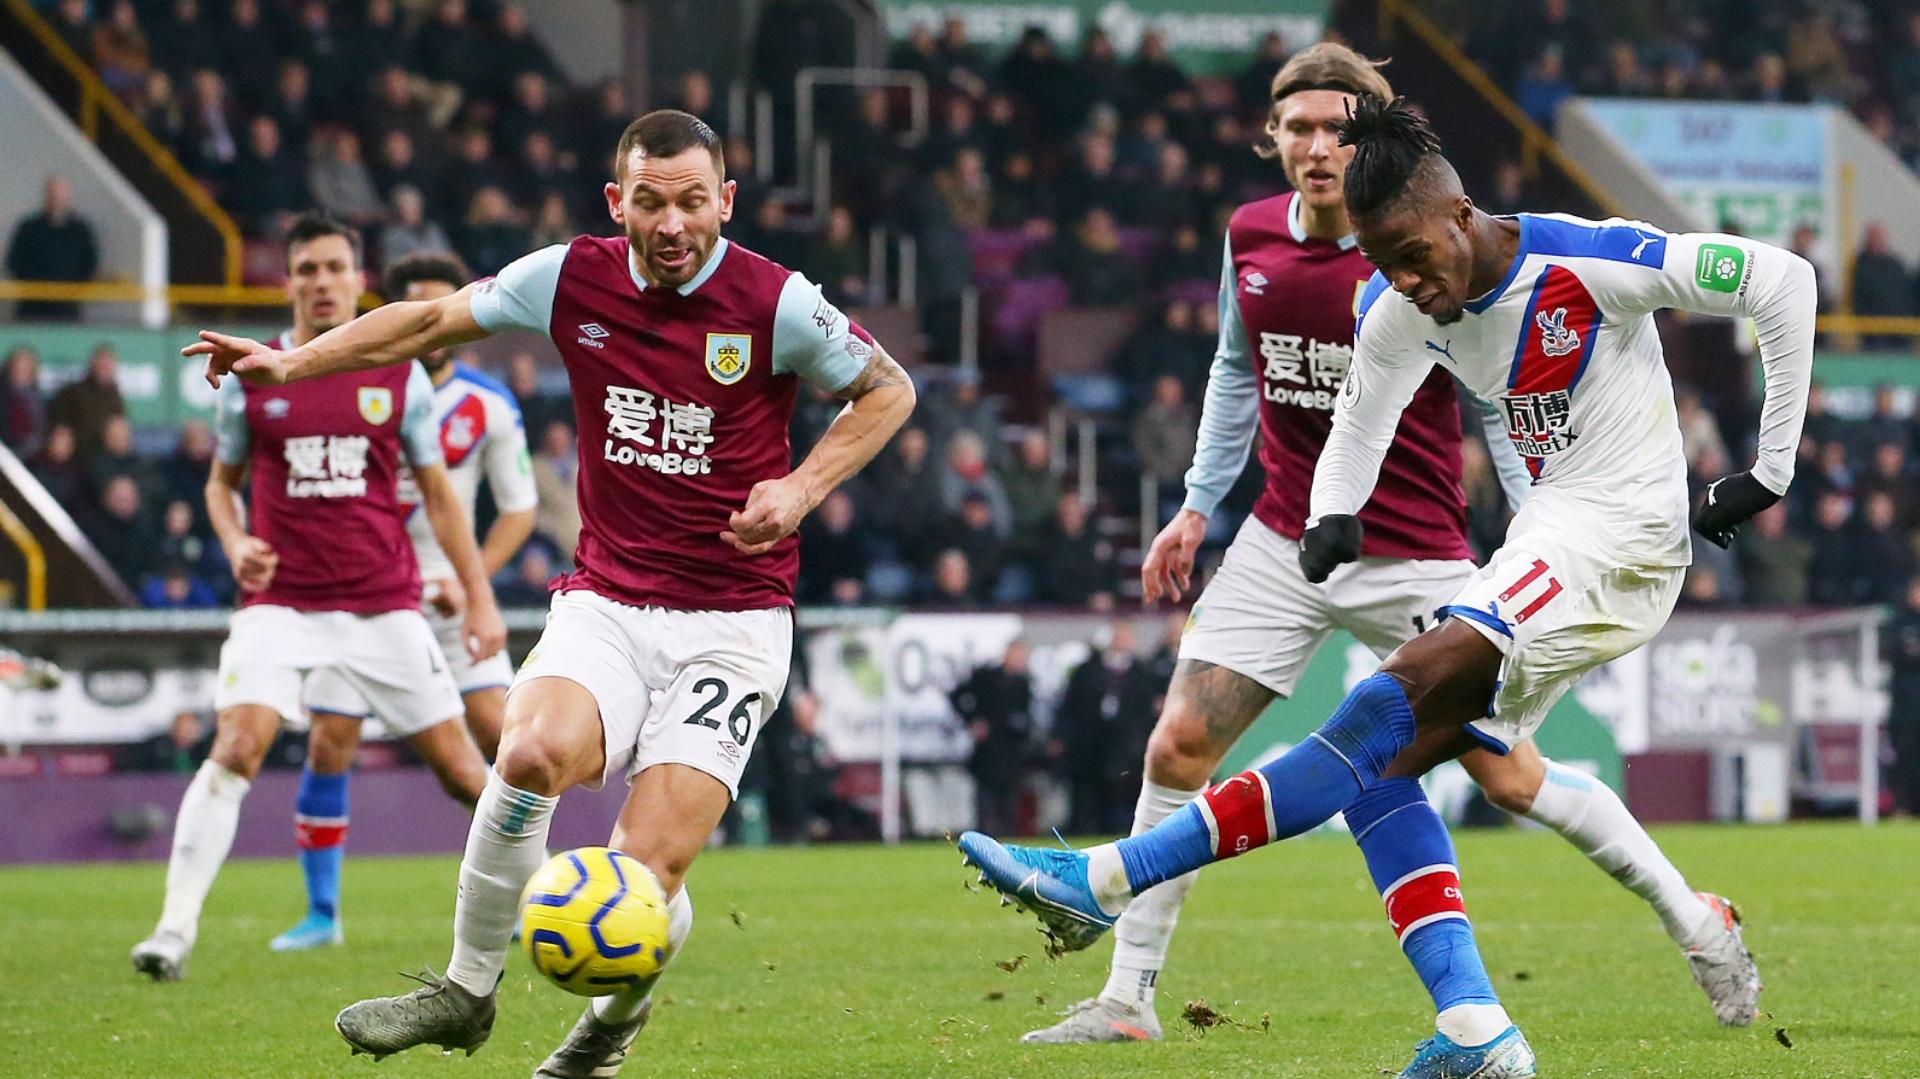 Crystal Palace vs. AFC Bournemouth - Football Match Report